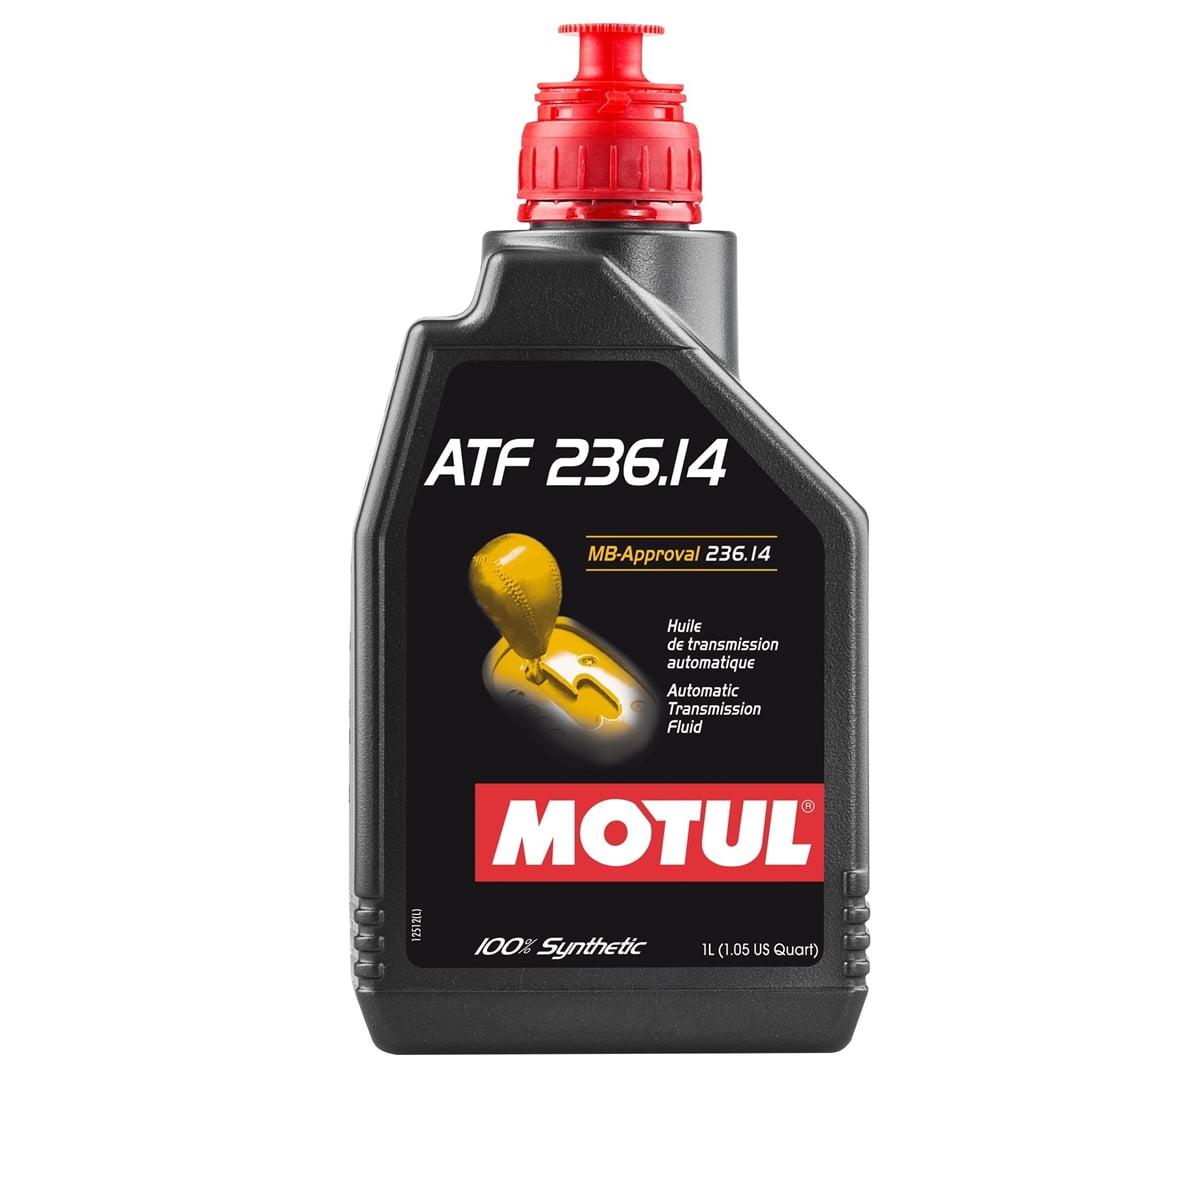 Oleo De Cambio Automático Motul ATF 236.14 100% Sinético 1LT